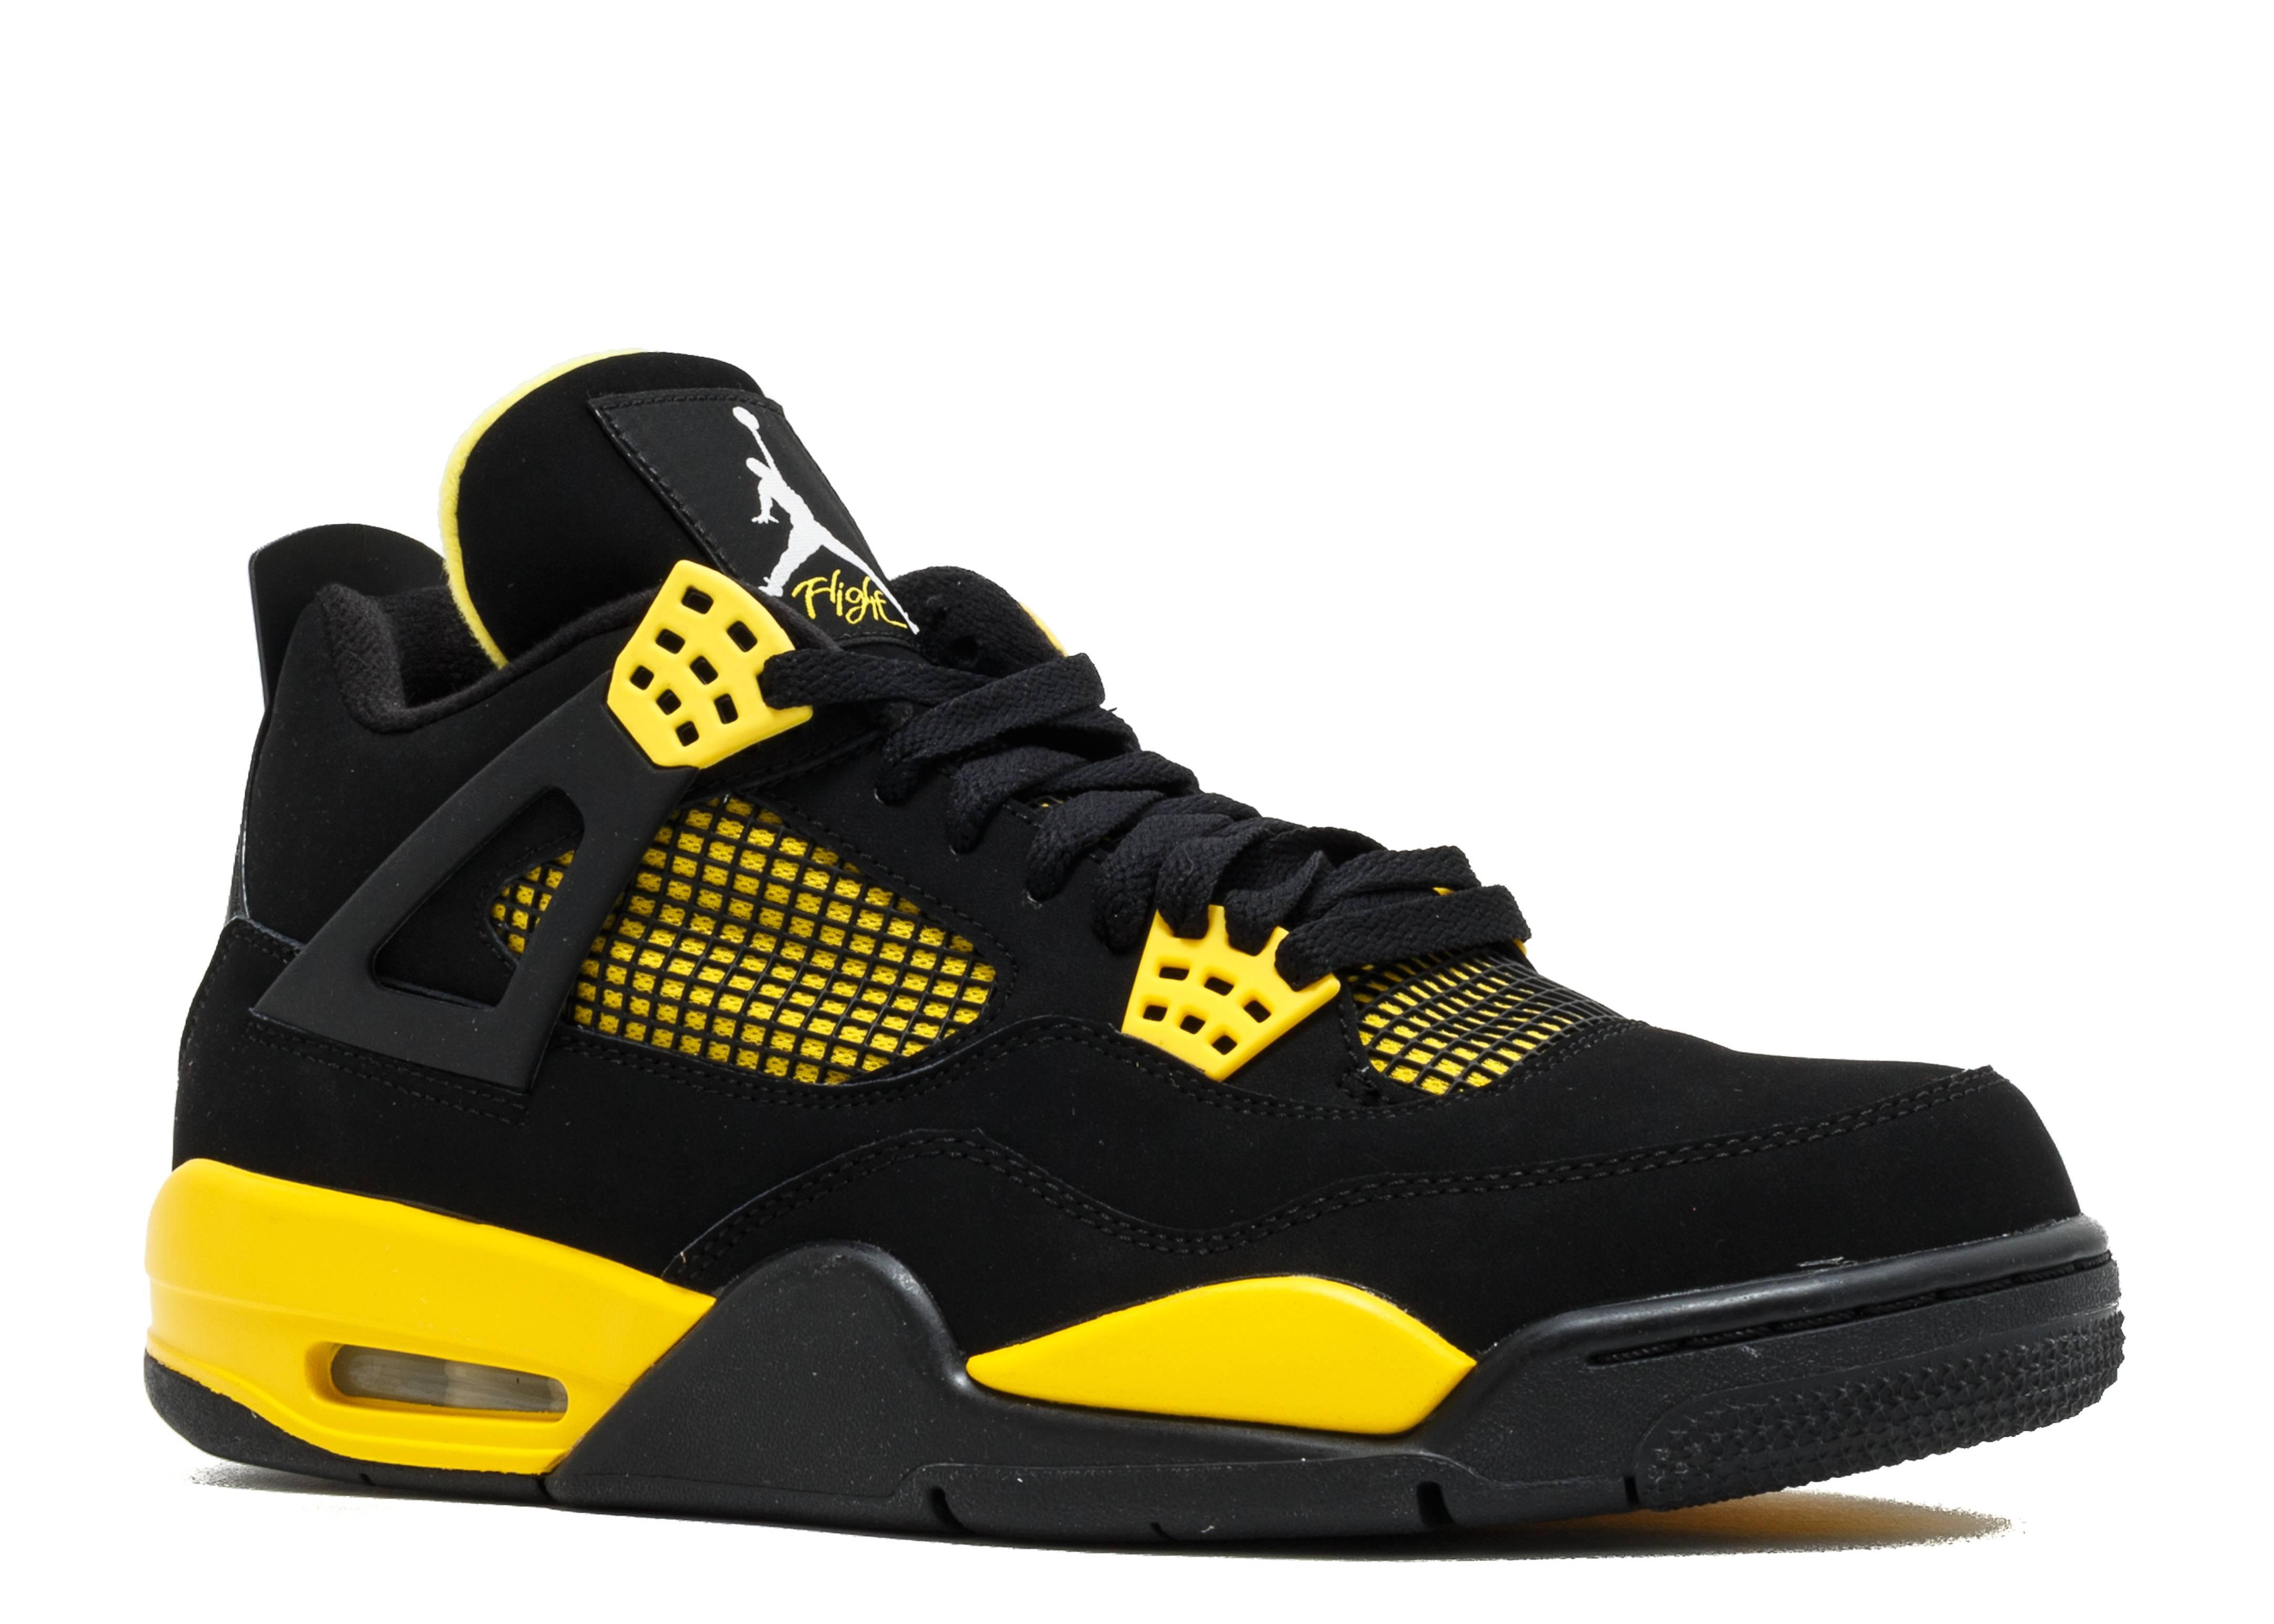 jordan retro 4 yellow and black